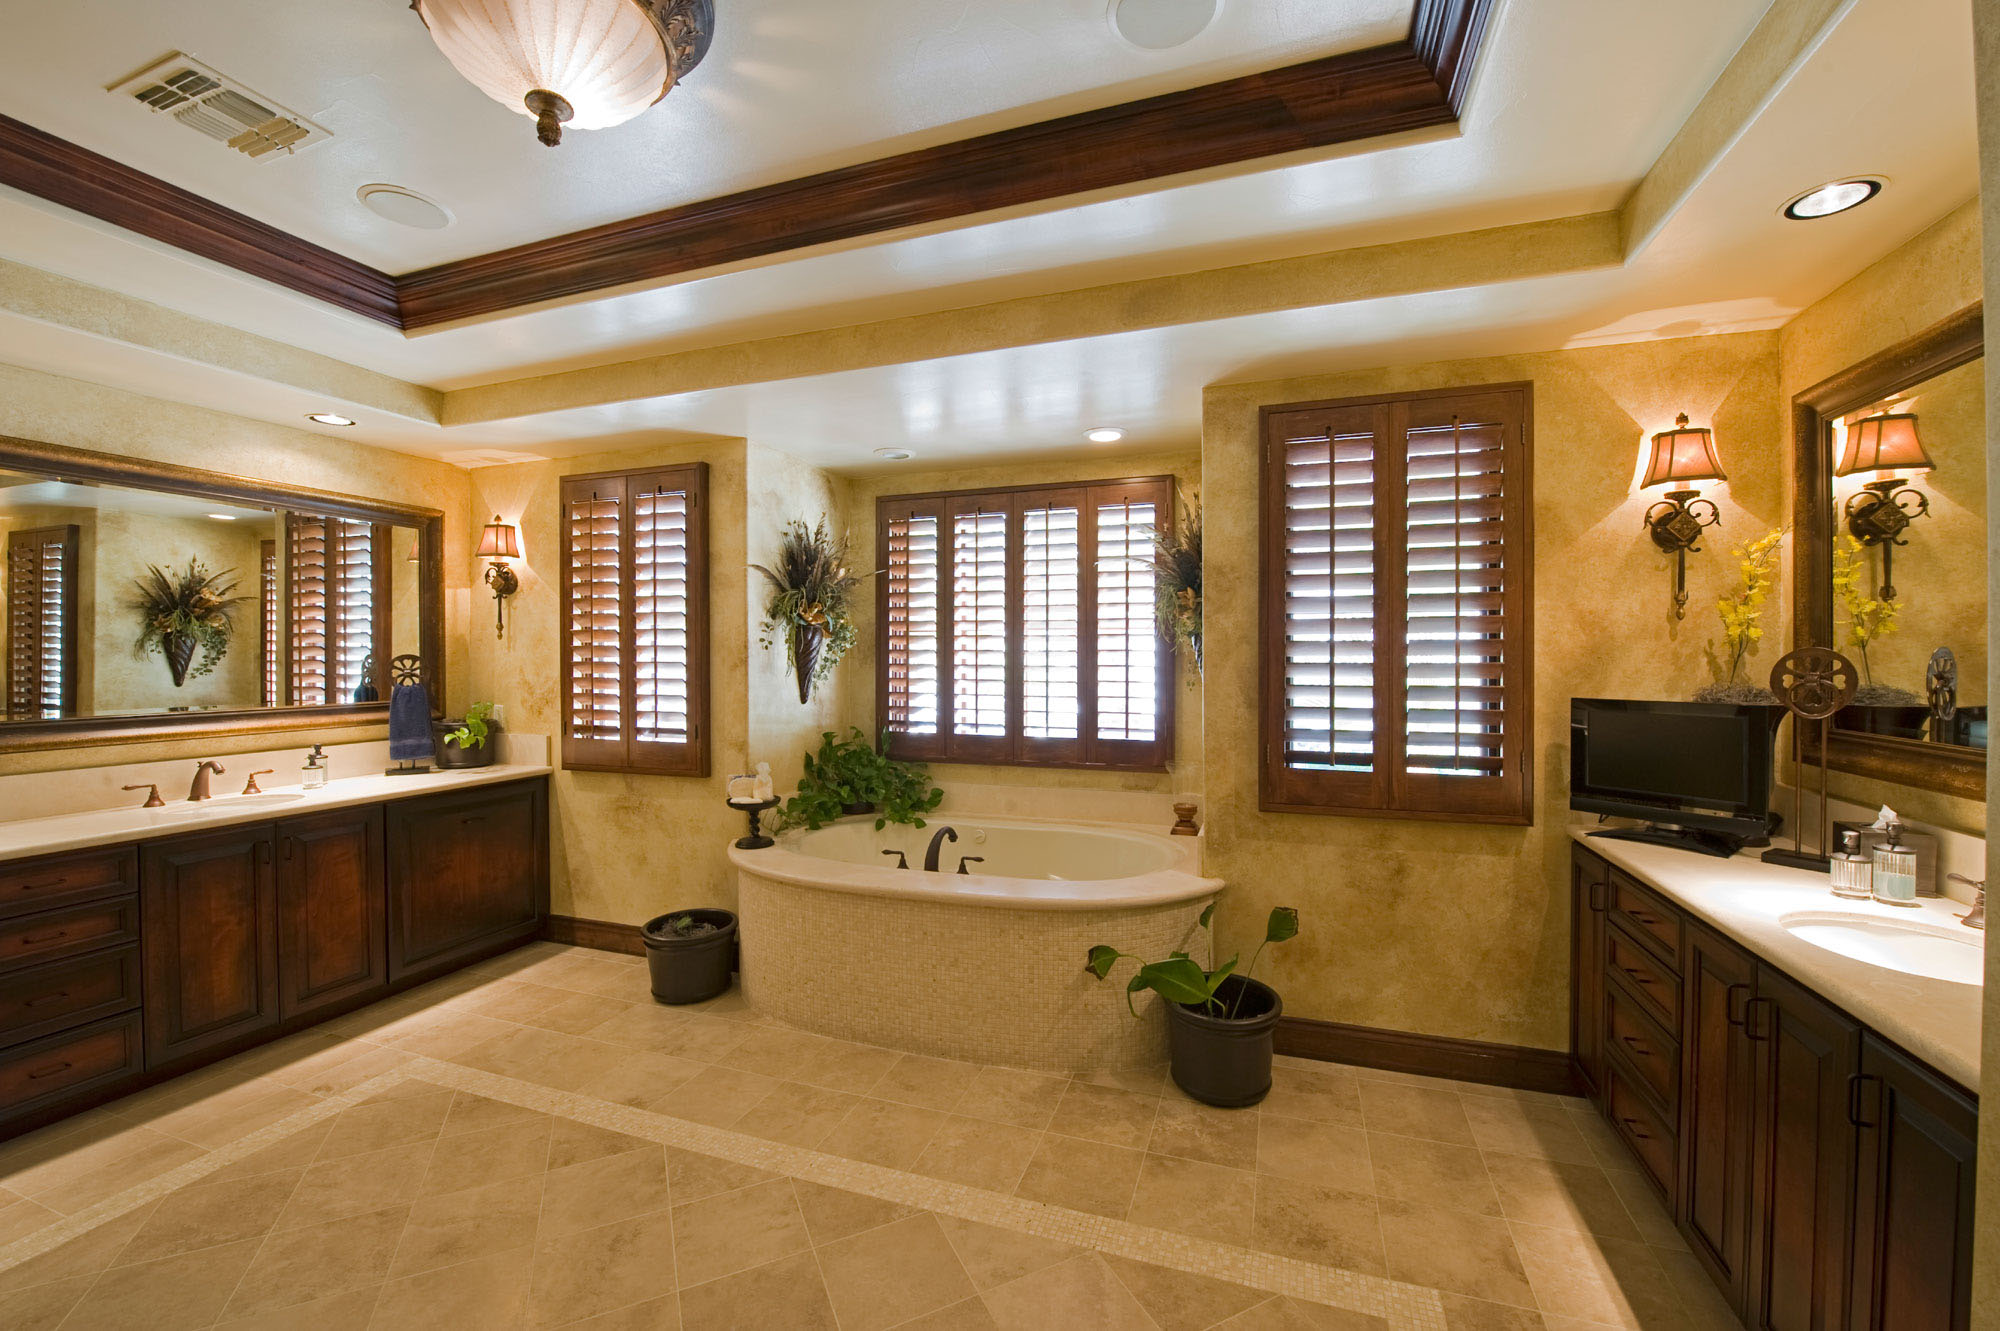 Bathroom Remodeling Fort Worth Bathroomwoodall Bathroom Remodeling - Bathroom remodel fort worth